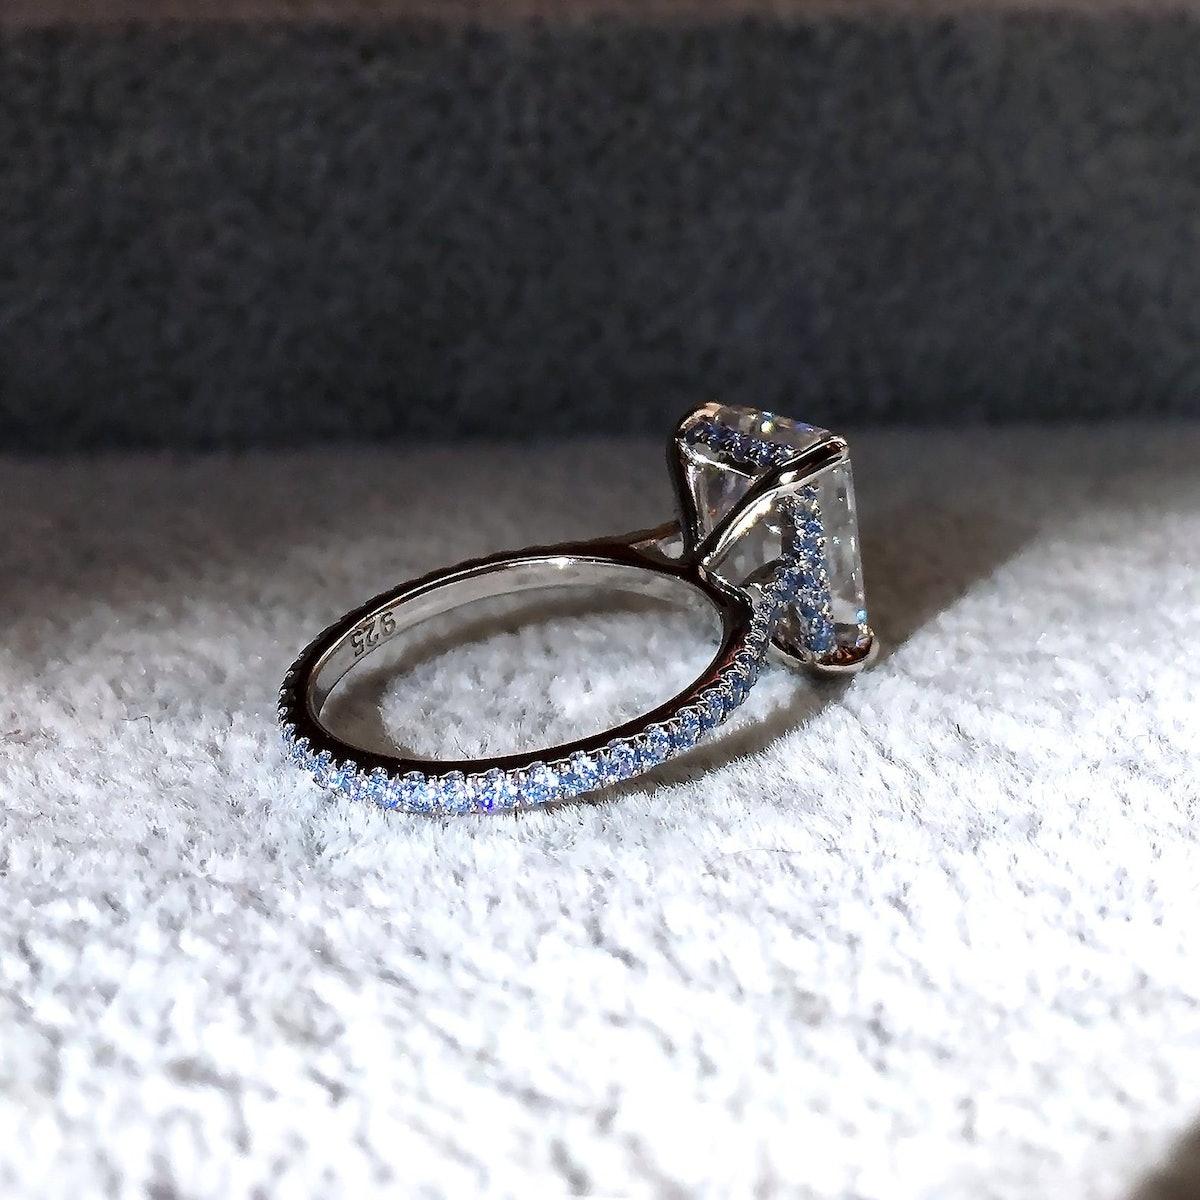 3 Ct Blue Diamond Simulant Engagement Ring 14k White Gold